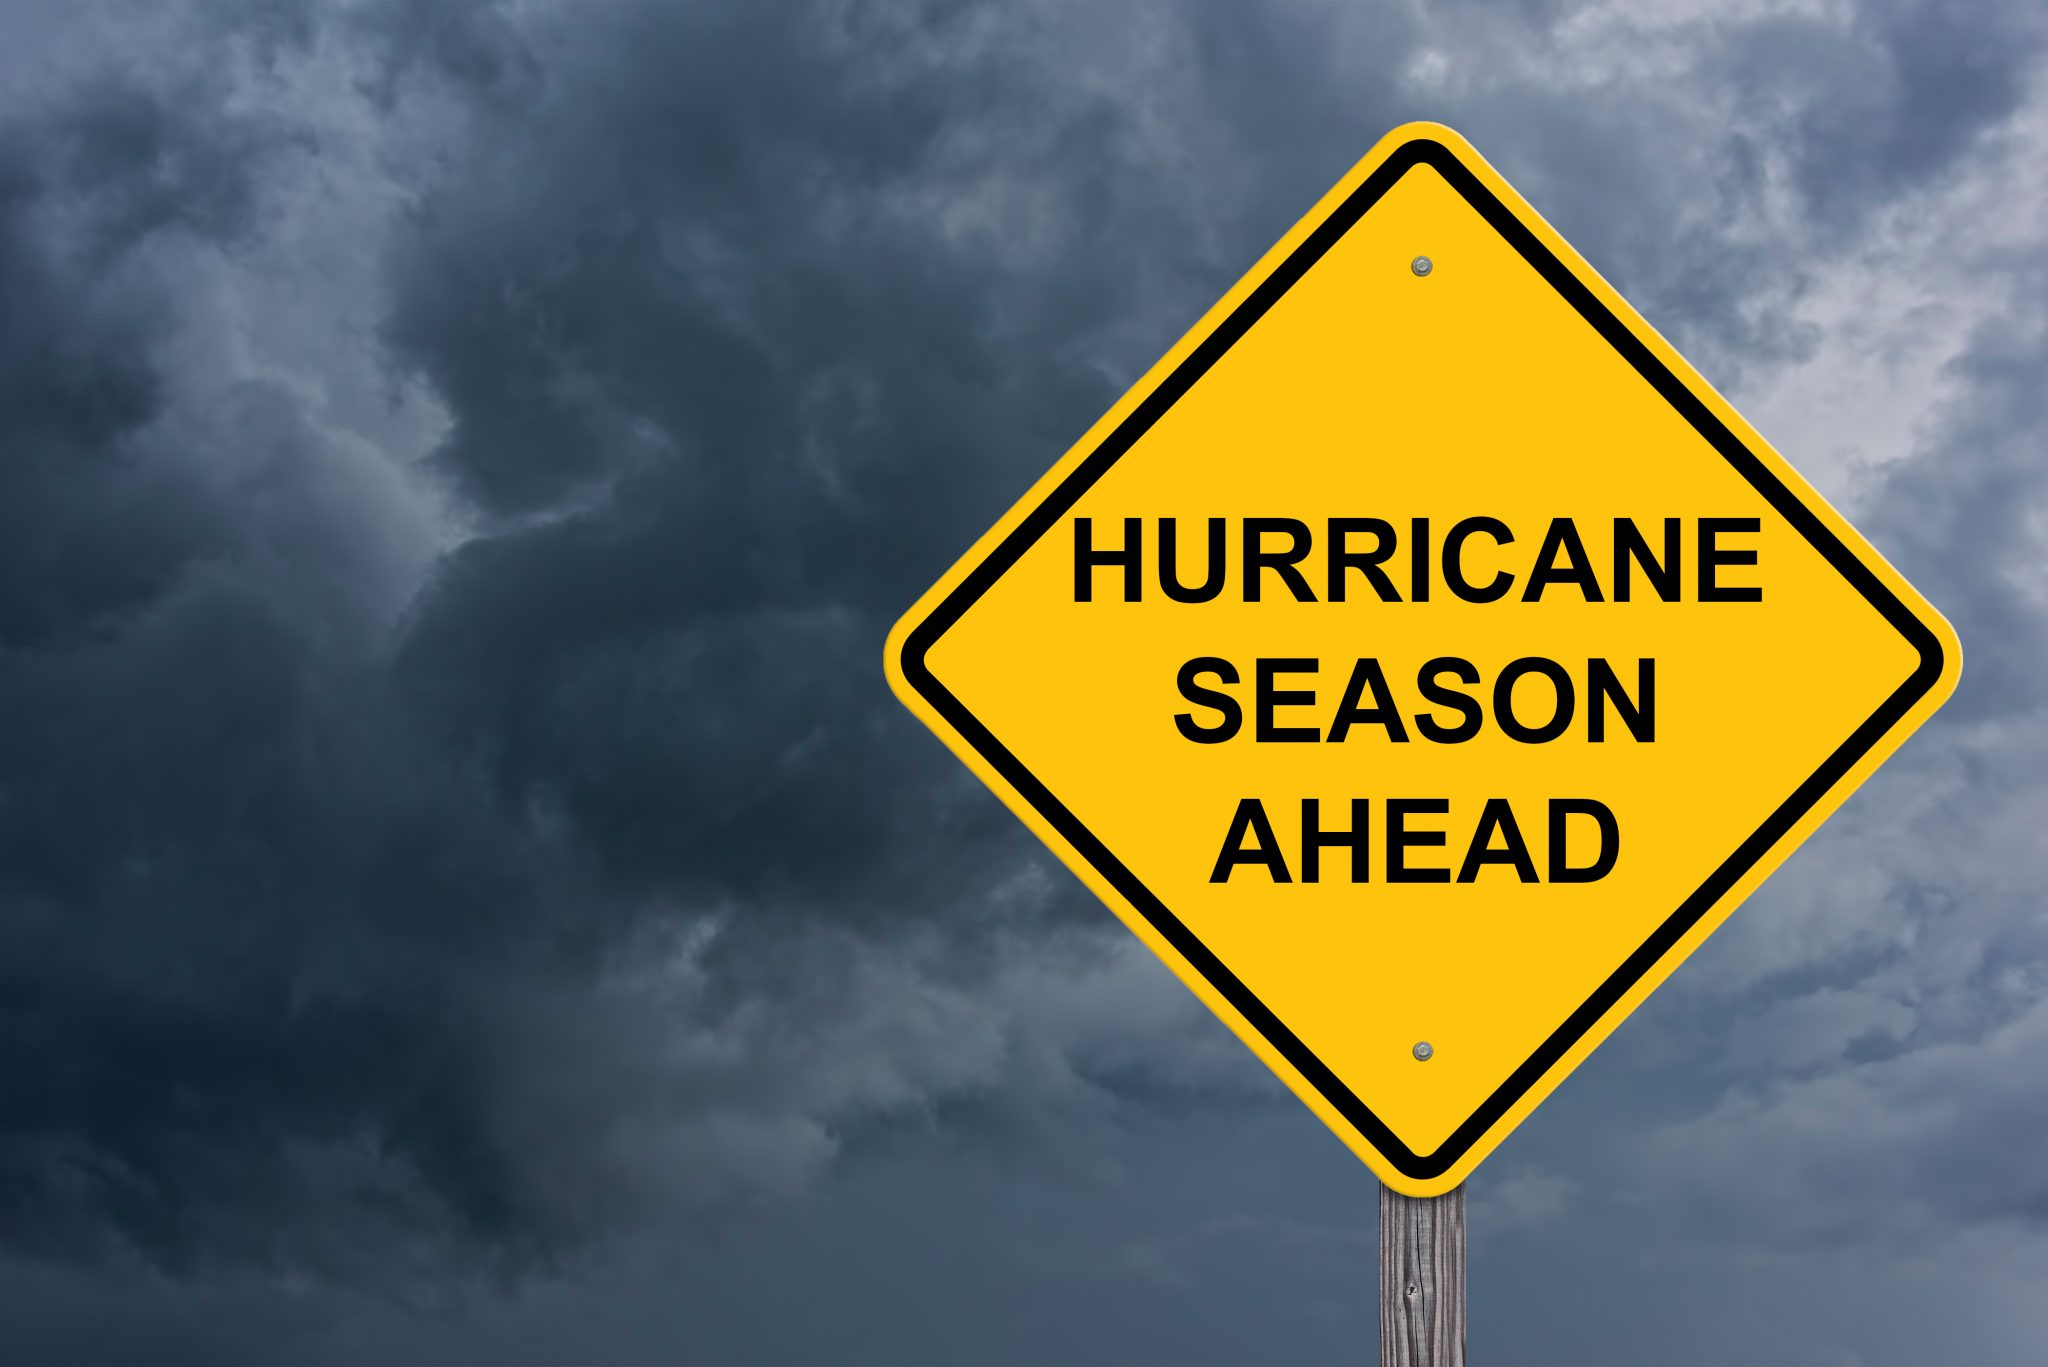 Hurricane Season Ahead